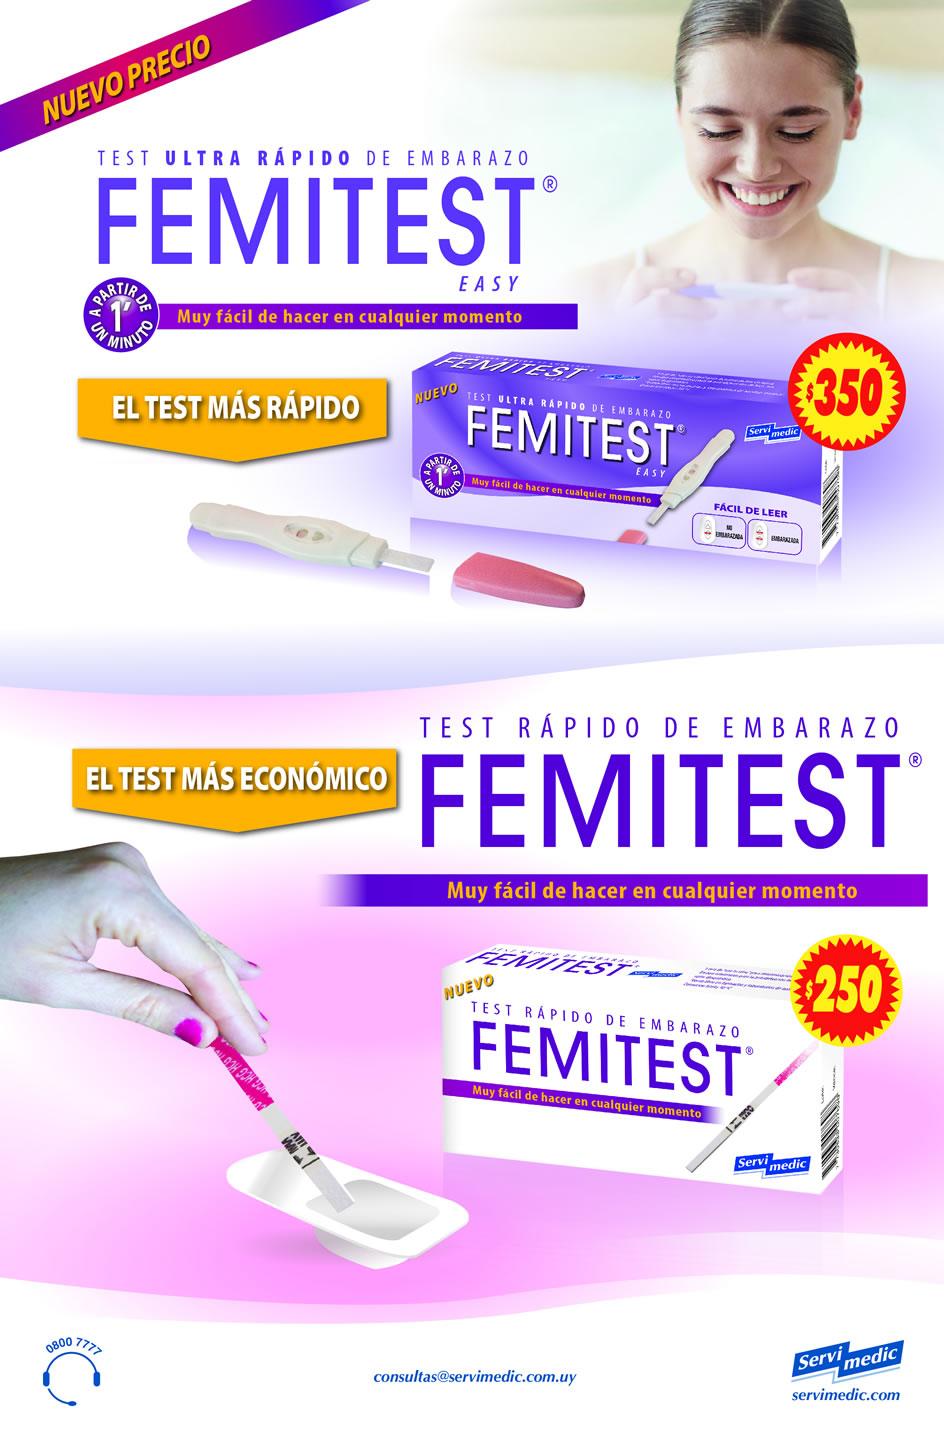 Femitest - Marzo